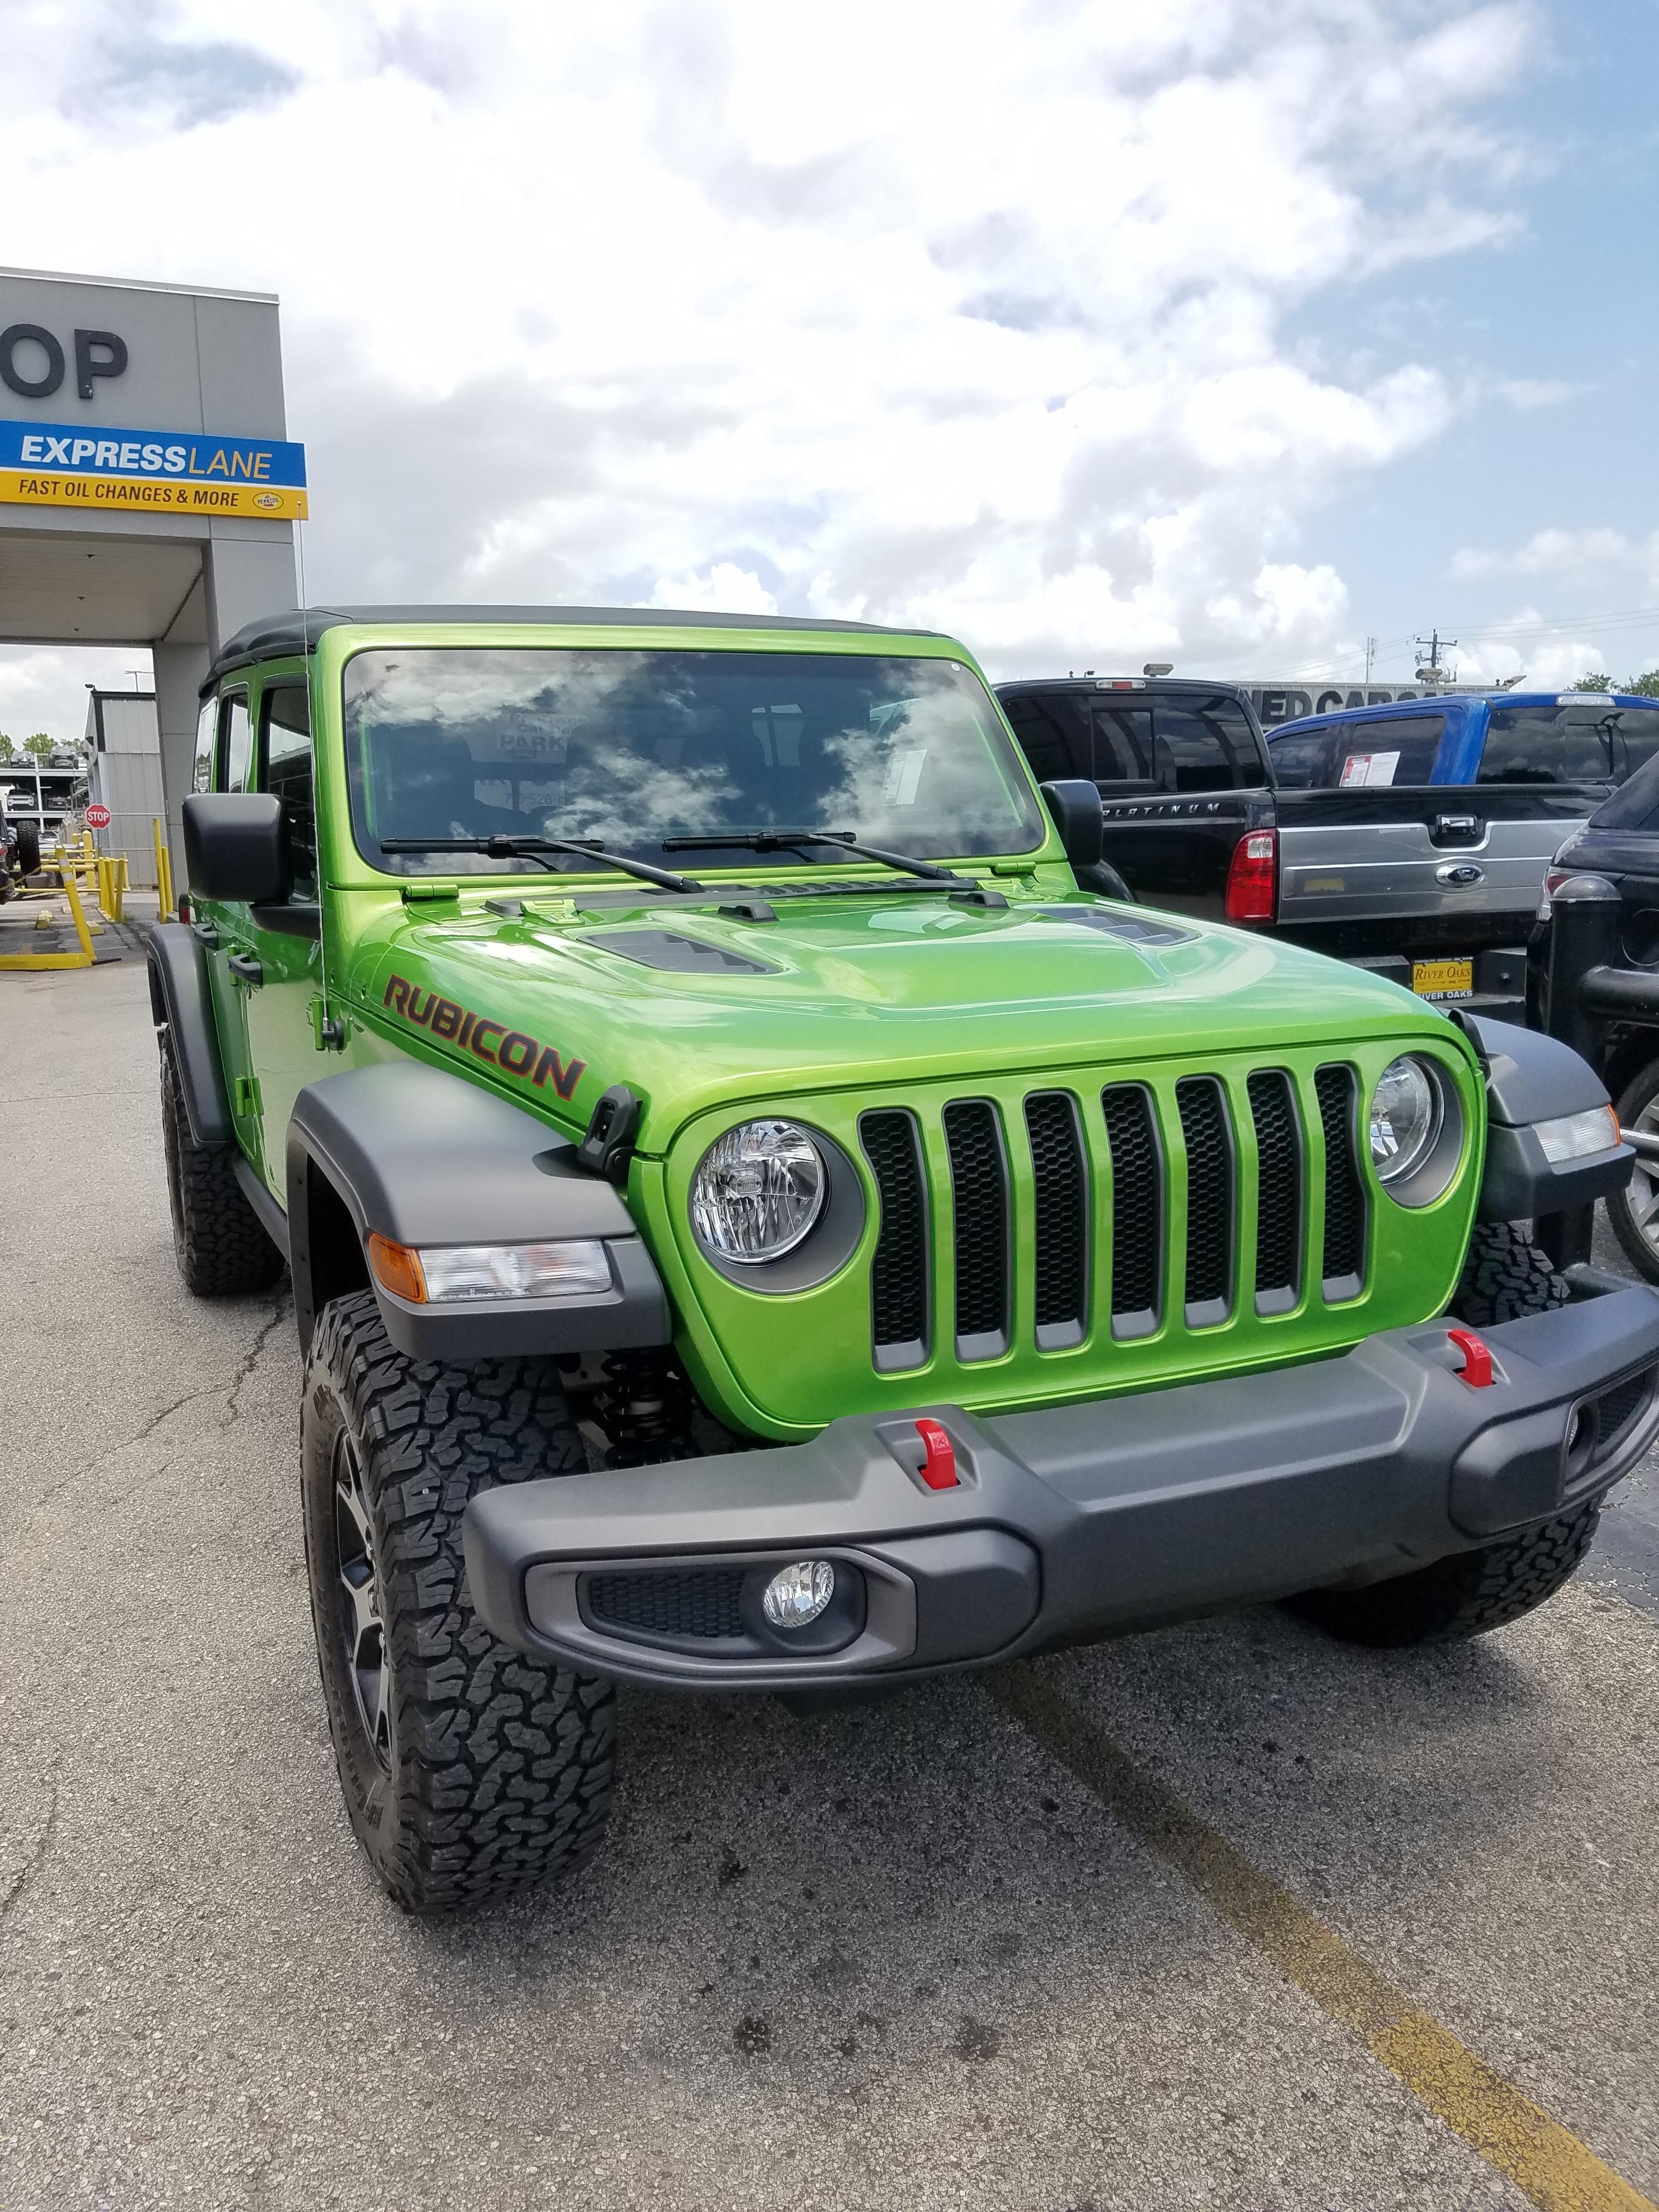 Mojito Jeep Wrangler : mojito, wrangler, Finally, Arrived!, Mojito, Houston!: